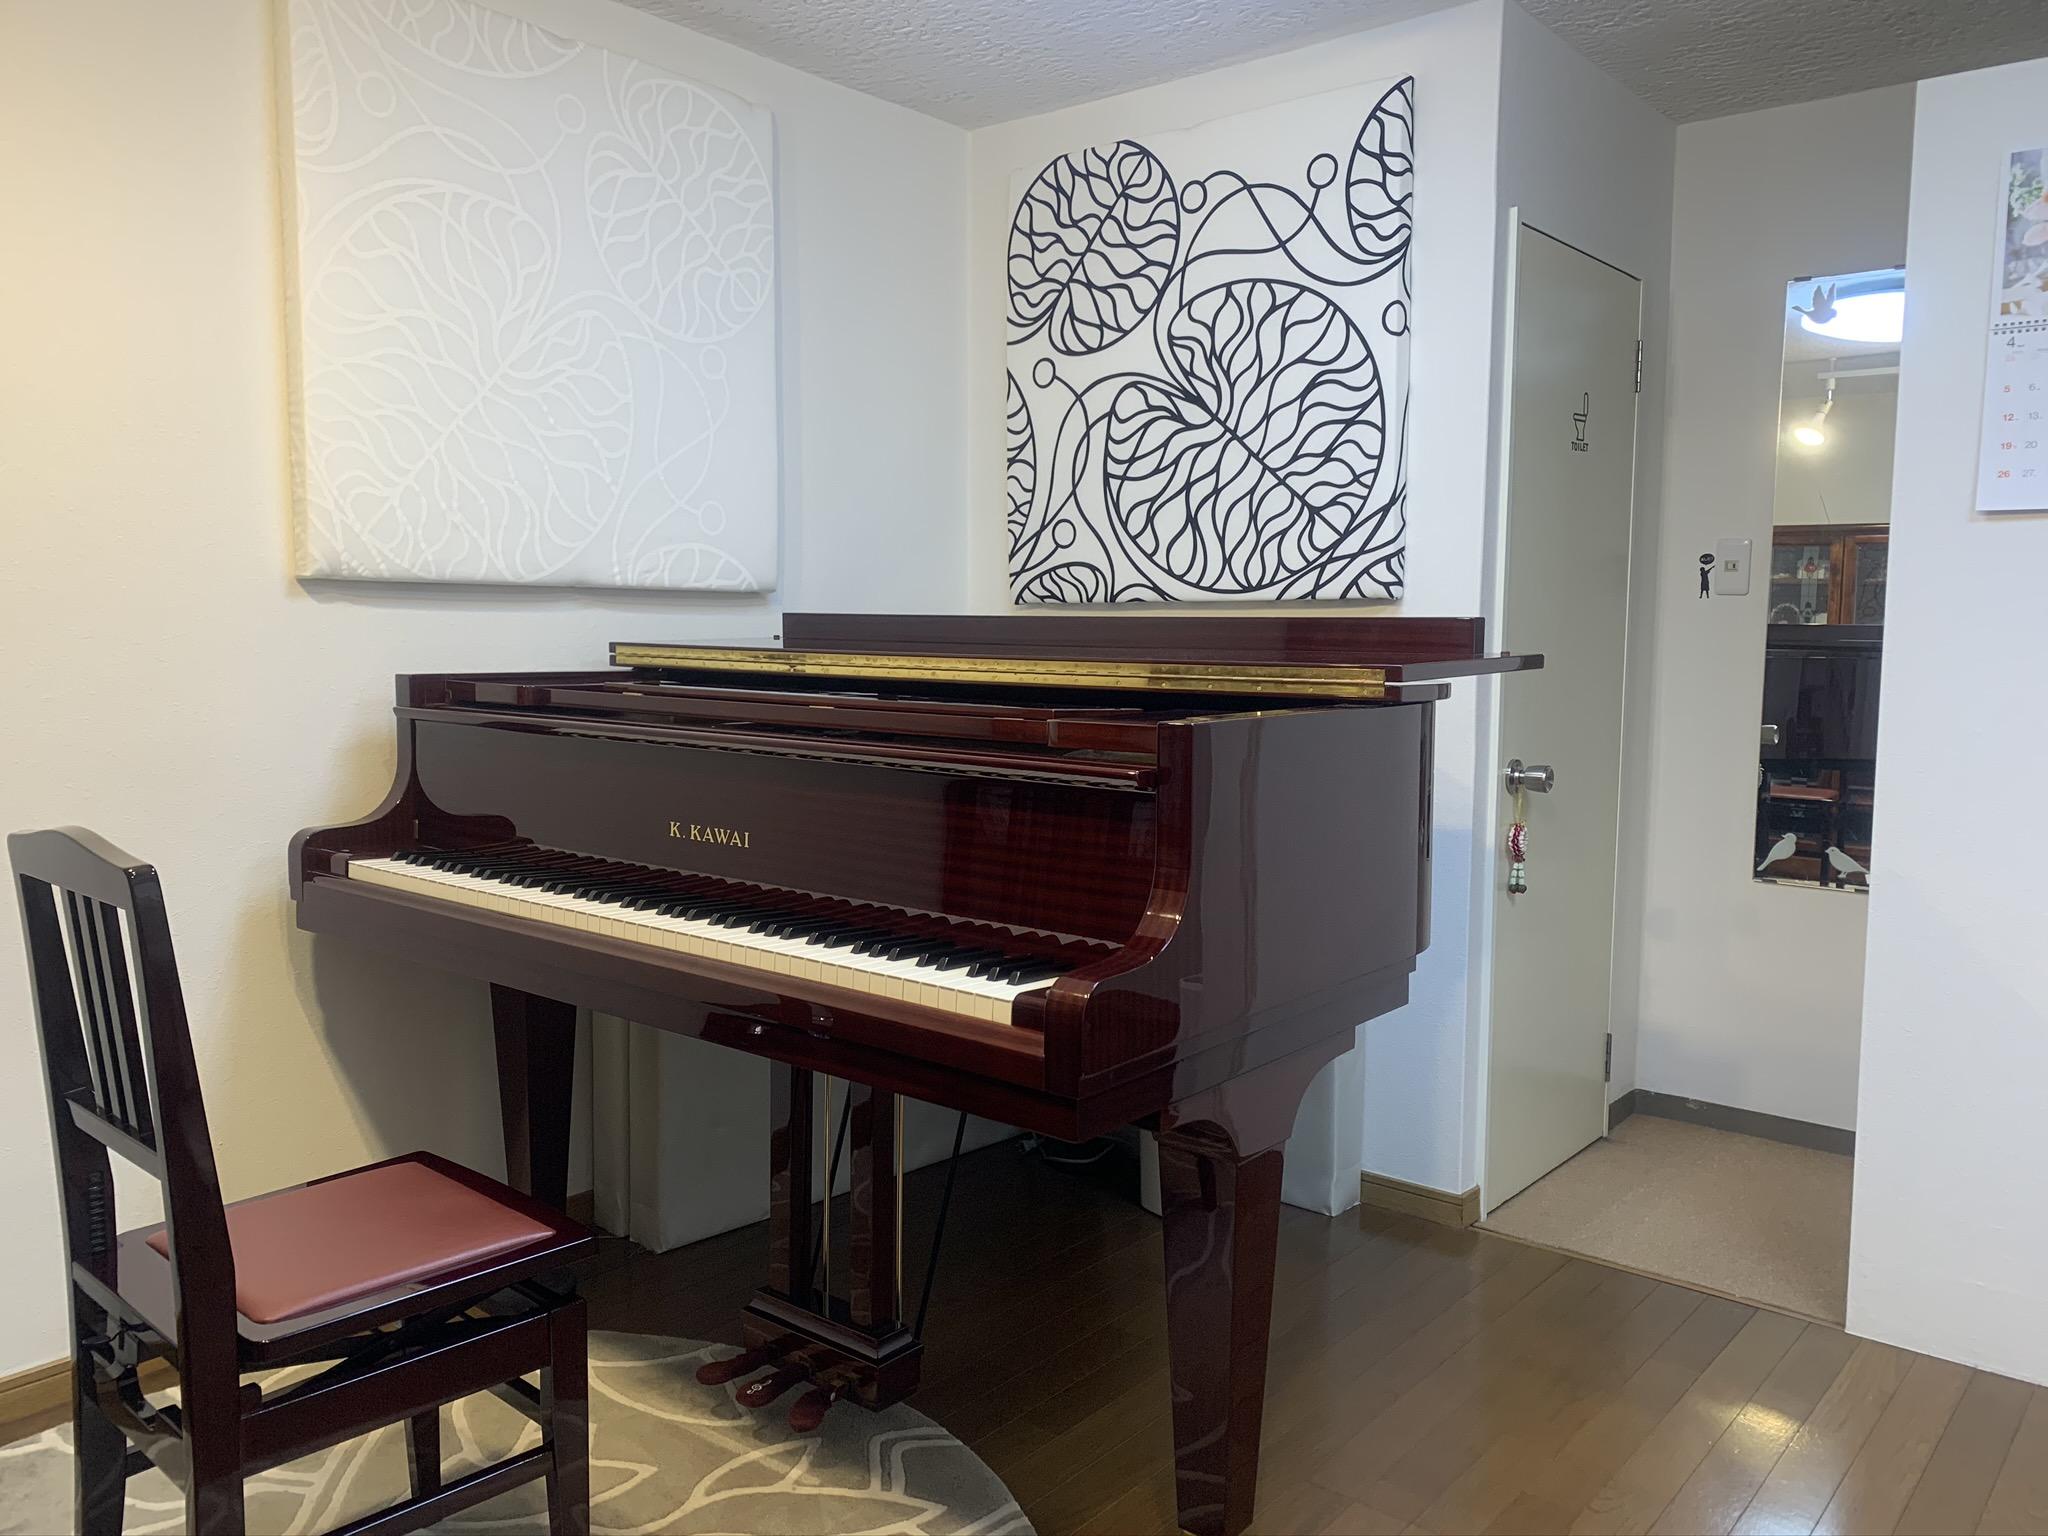 K.KAWAI  GE-20 レスロー弦に張り替え - Sheila M Space グランドピアノ・多目的スペースの室内の写真